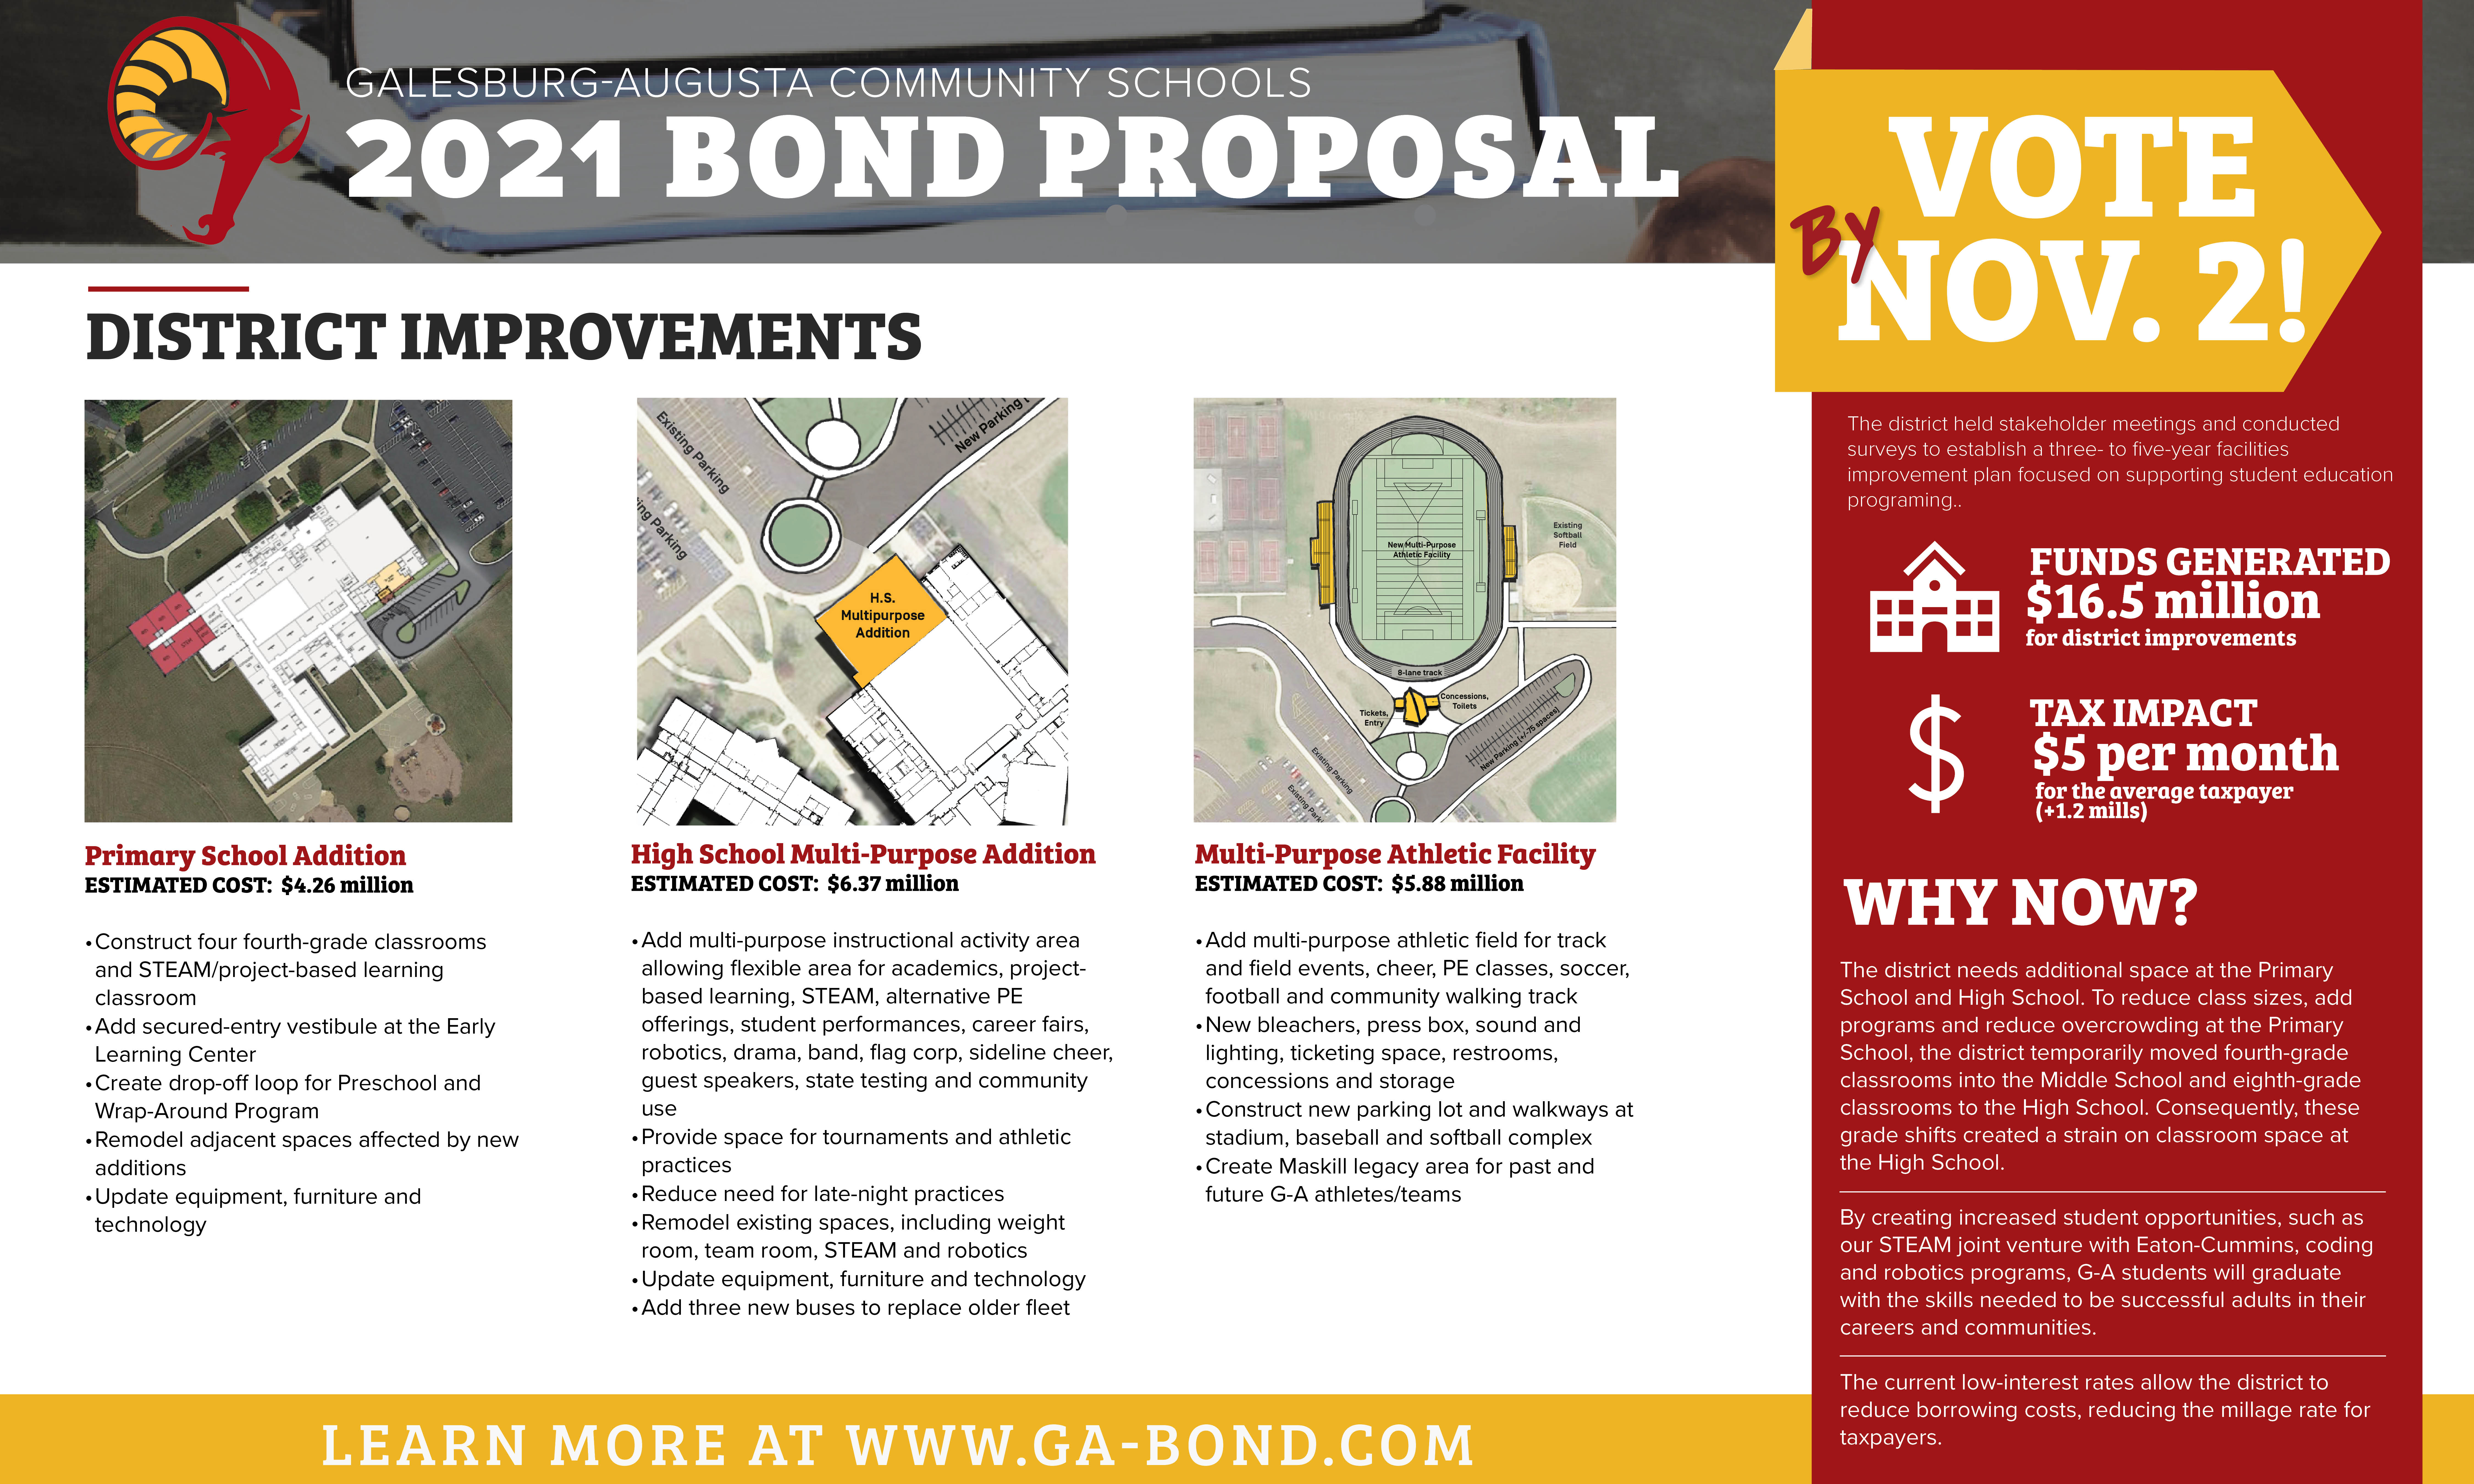 2021 Bond Proposal District Improvements